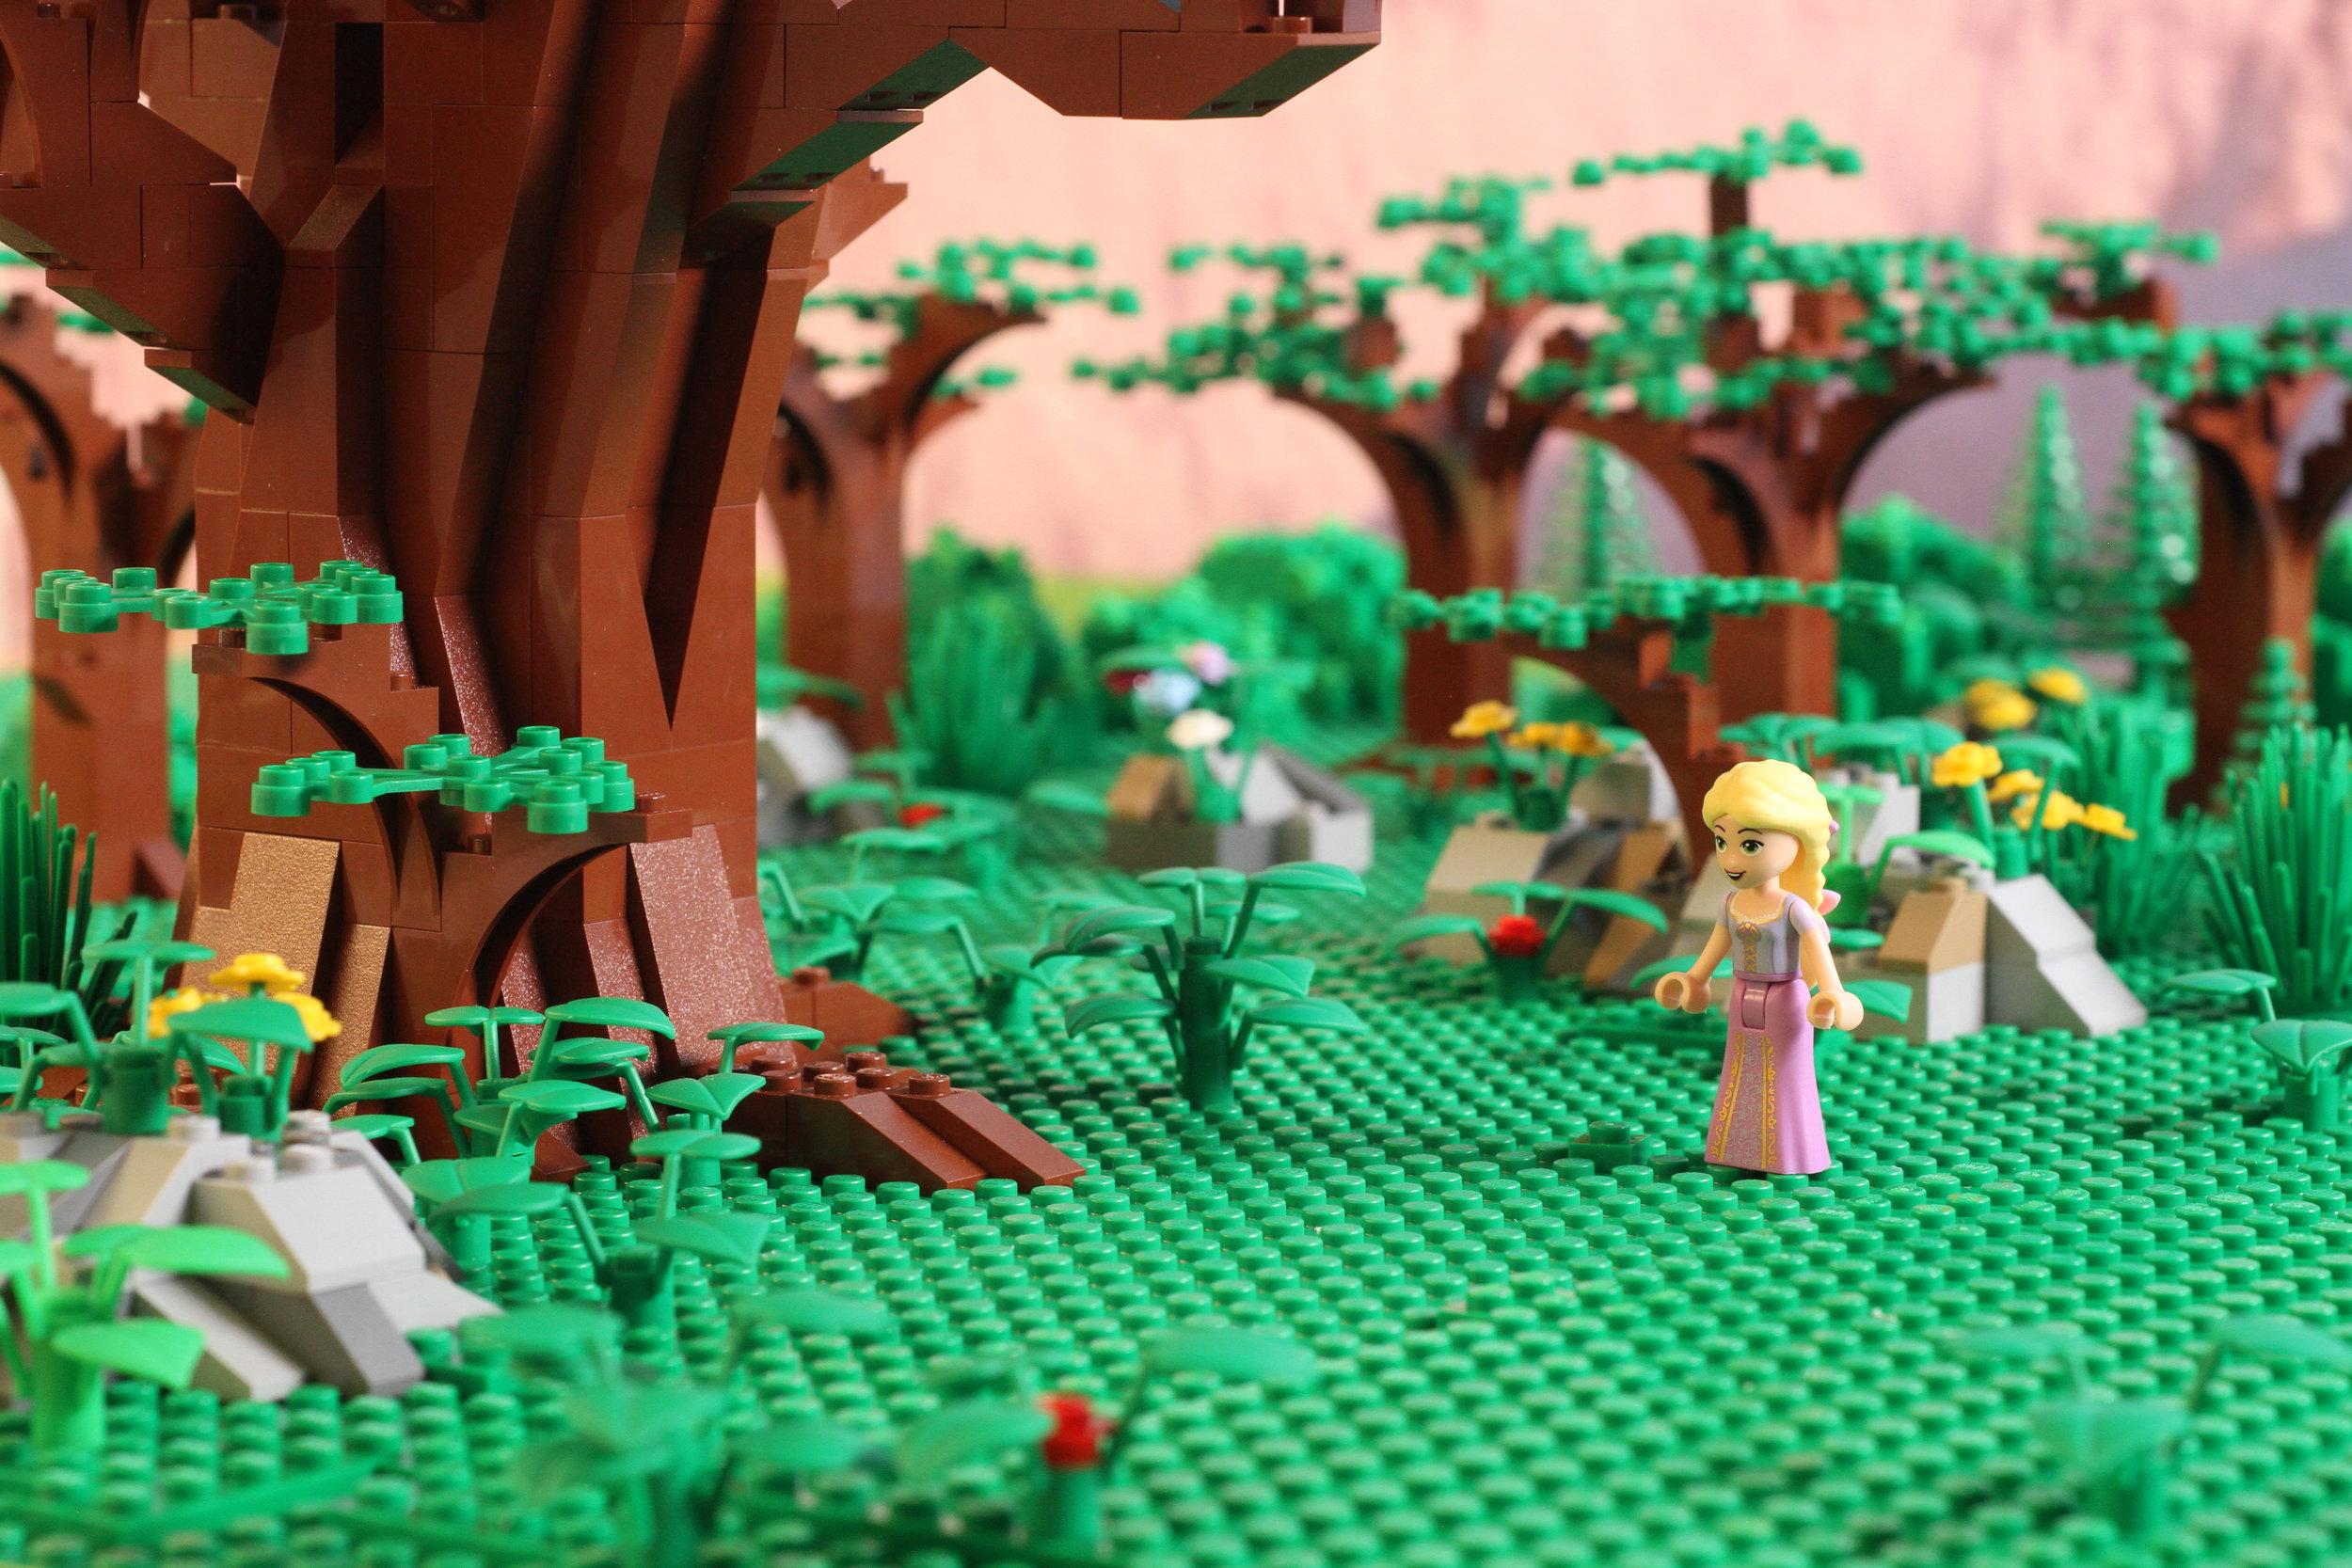 Princess_Rapunzel_sc130_X1_0015.jpg